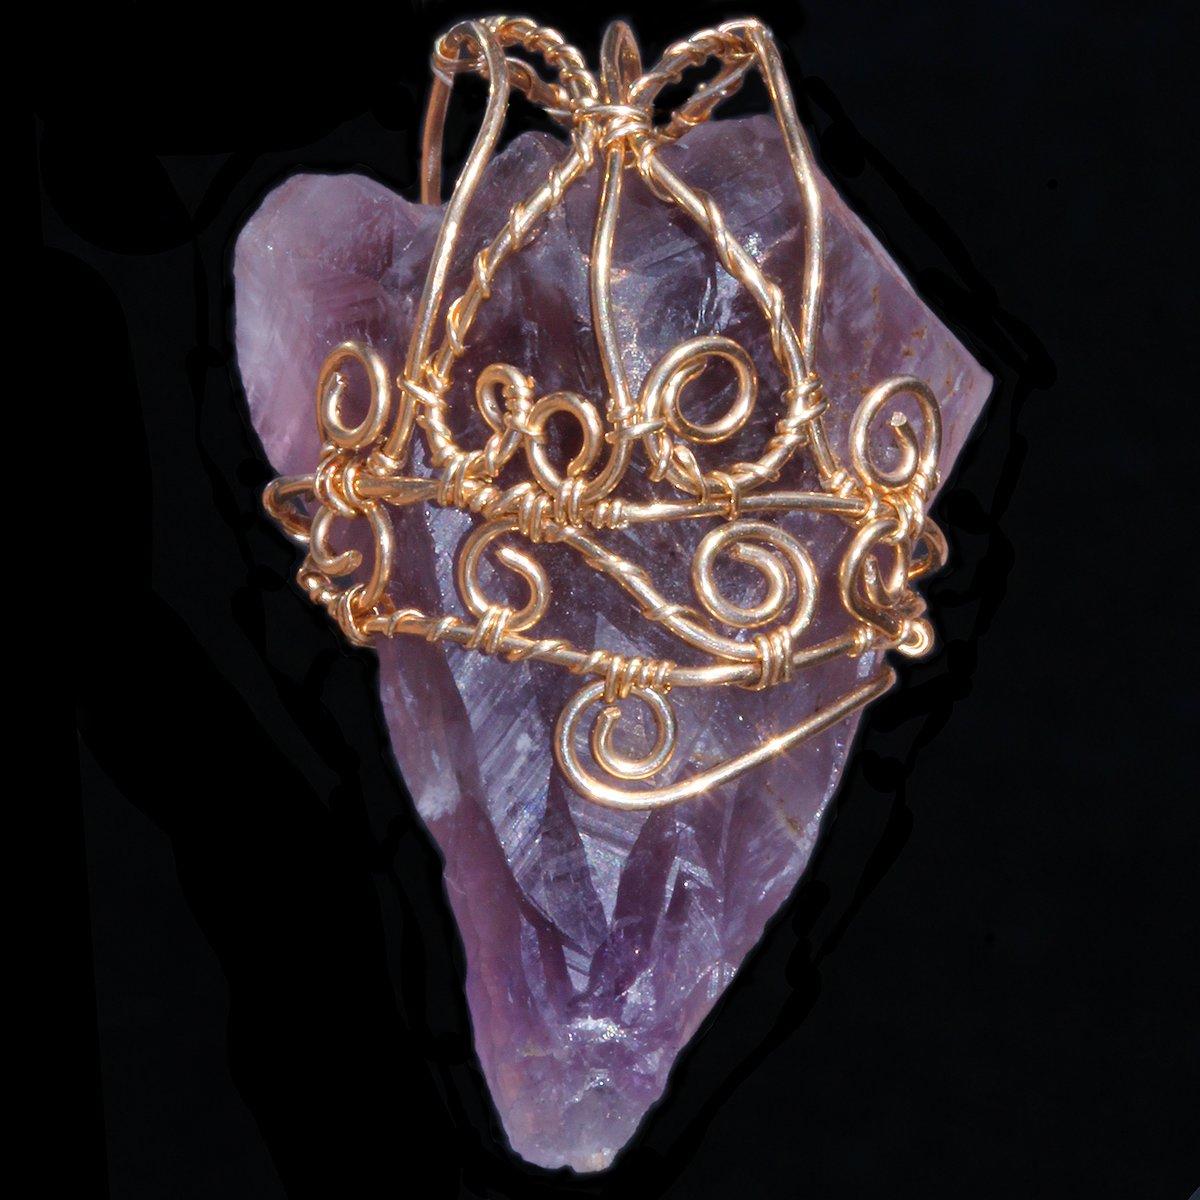 Auralite 23 Crystal Gold Filled Filigree Handmade Pendant